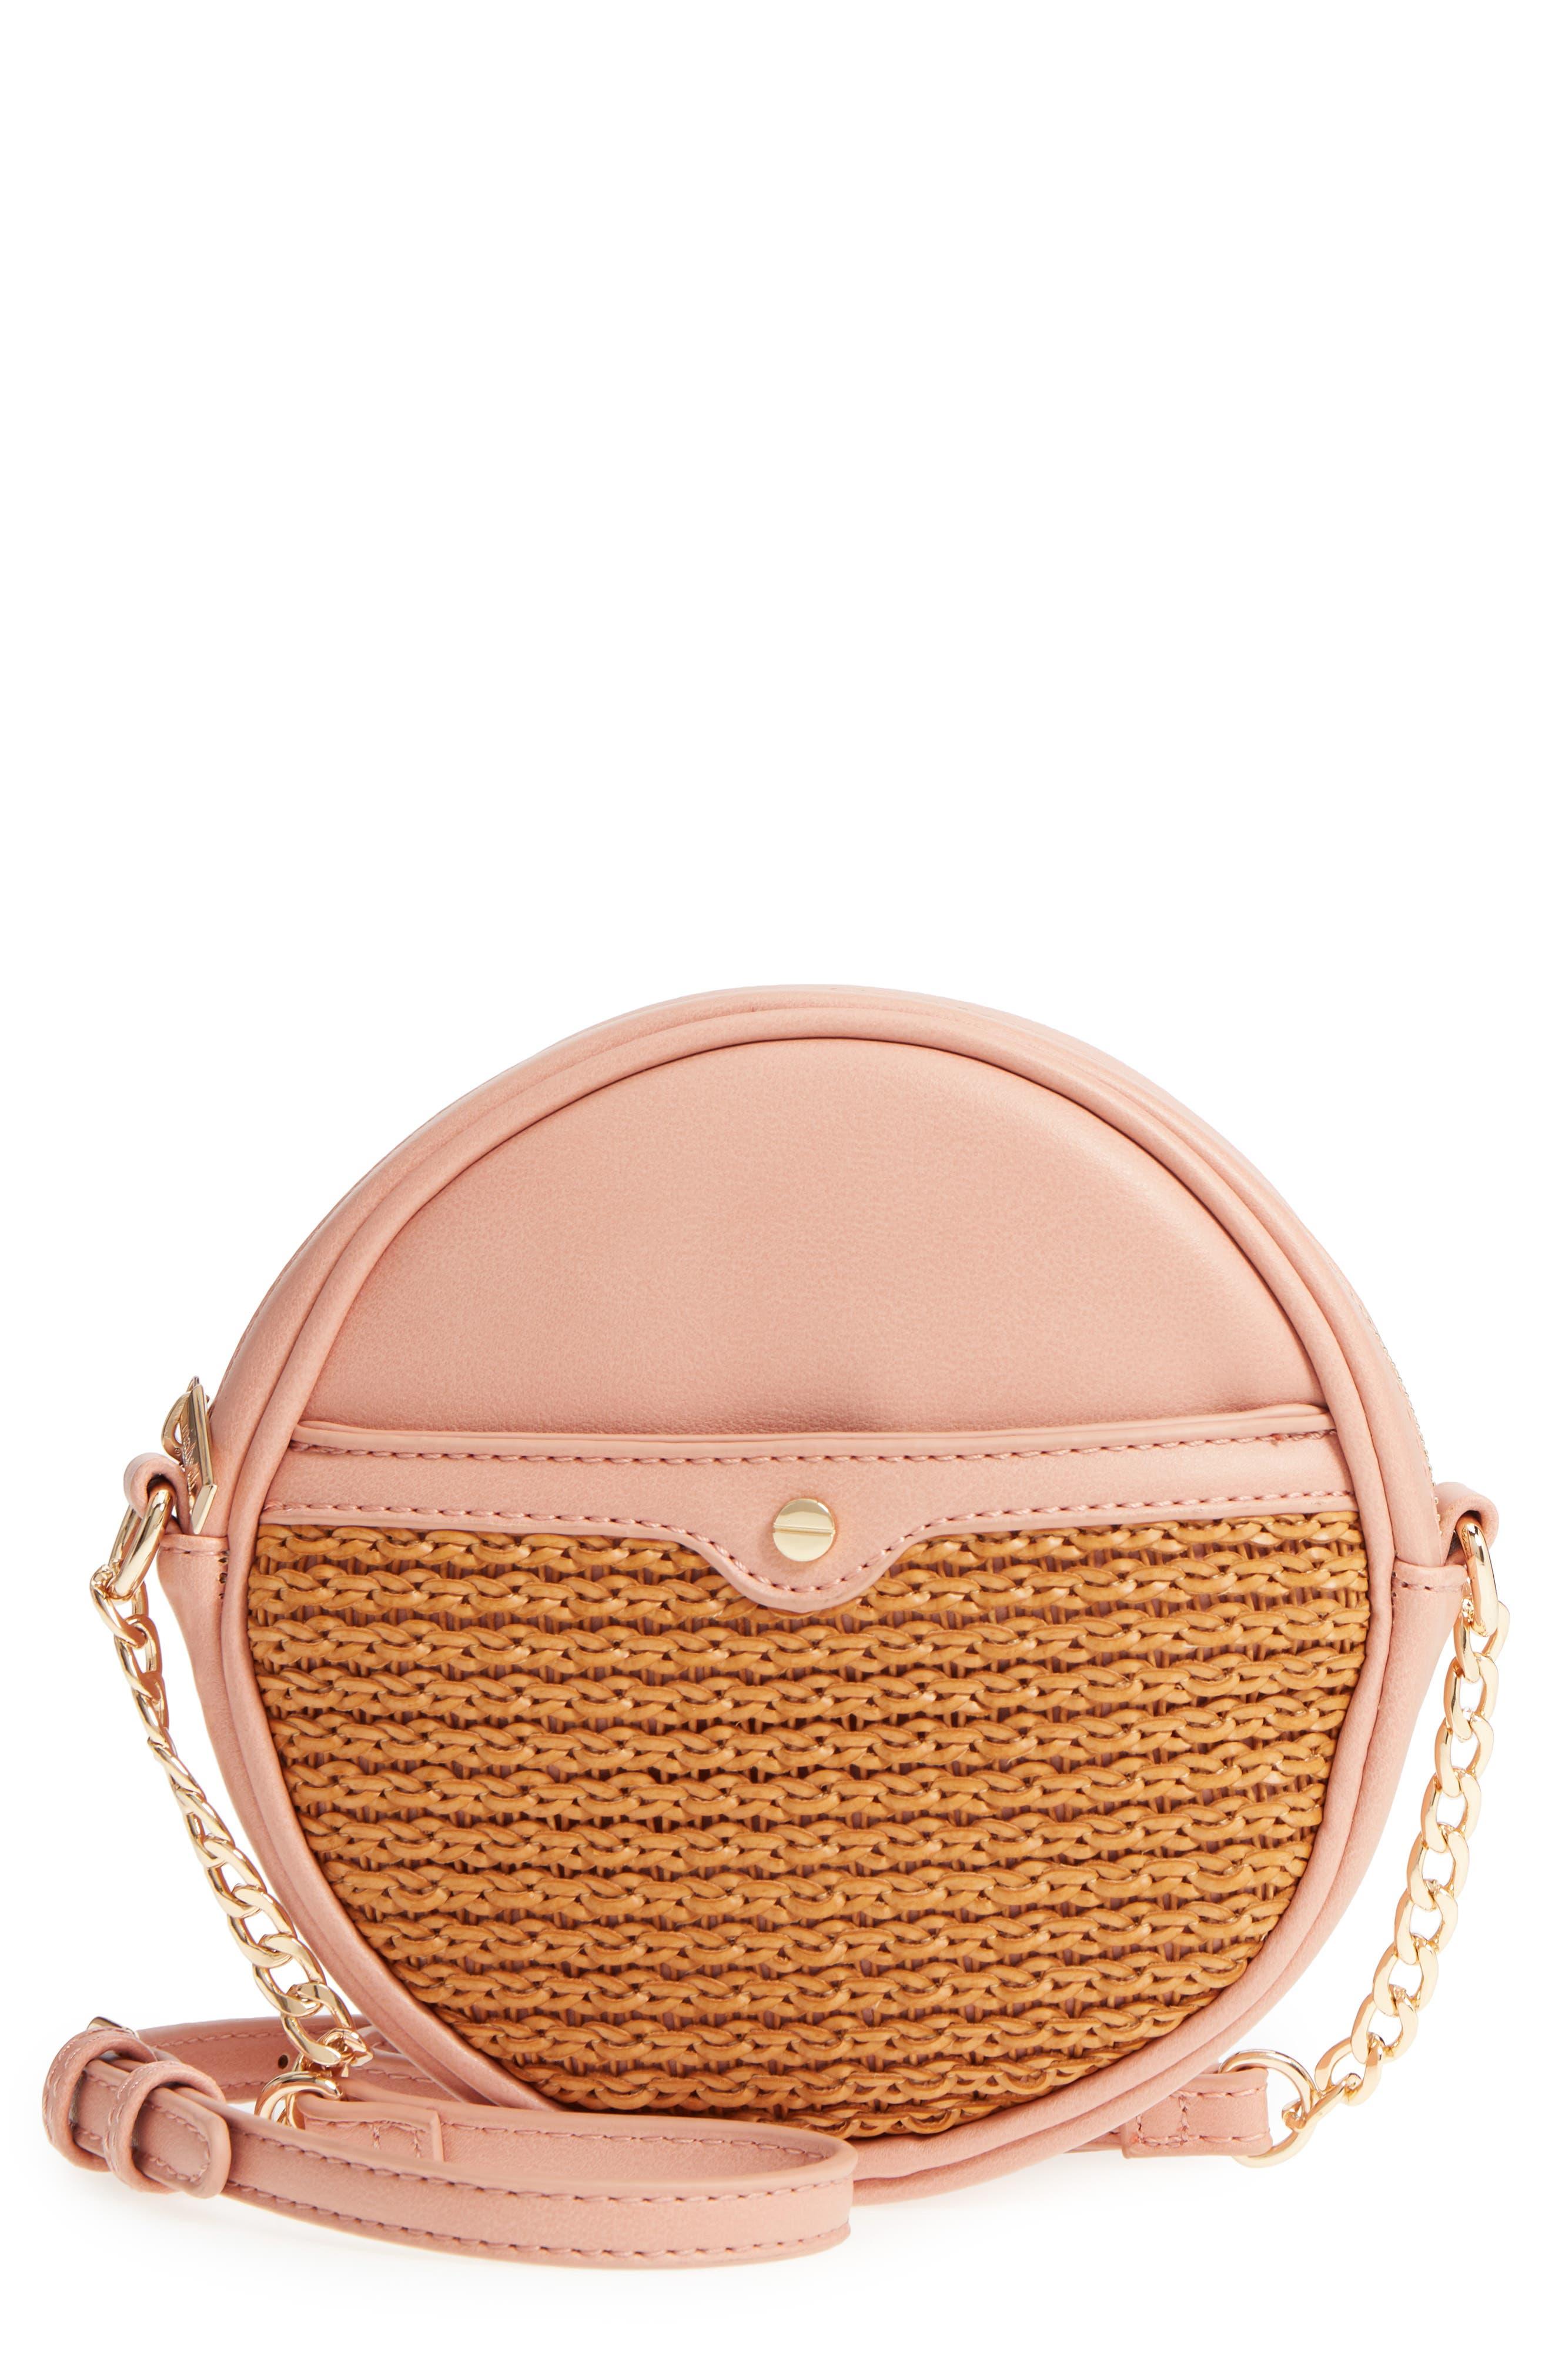 Mali + Lili Basket Weave Vegan Leather Canteen Crossbody Bag